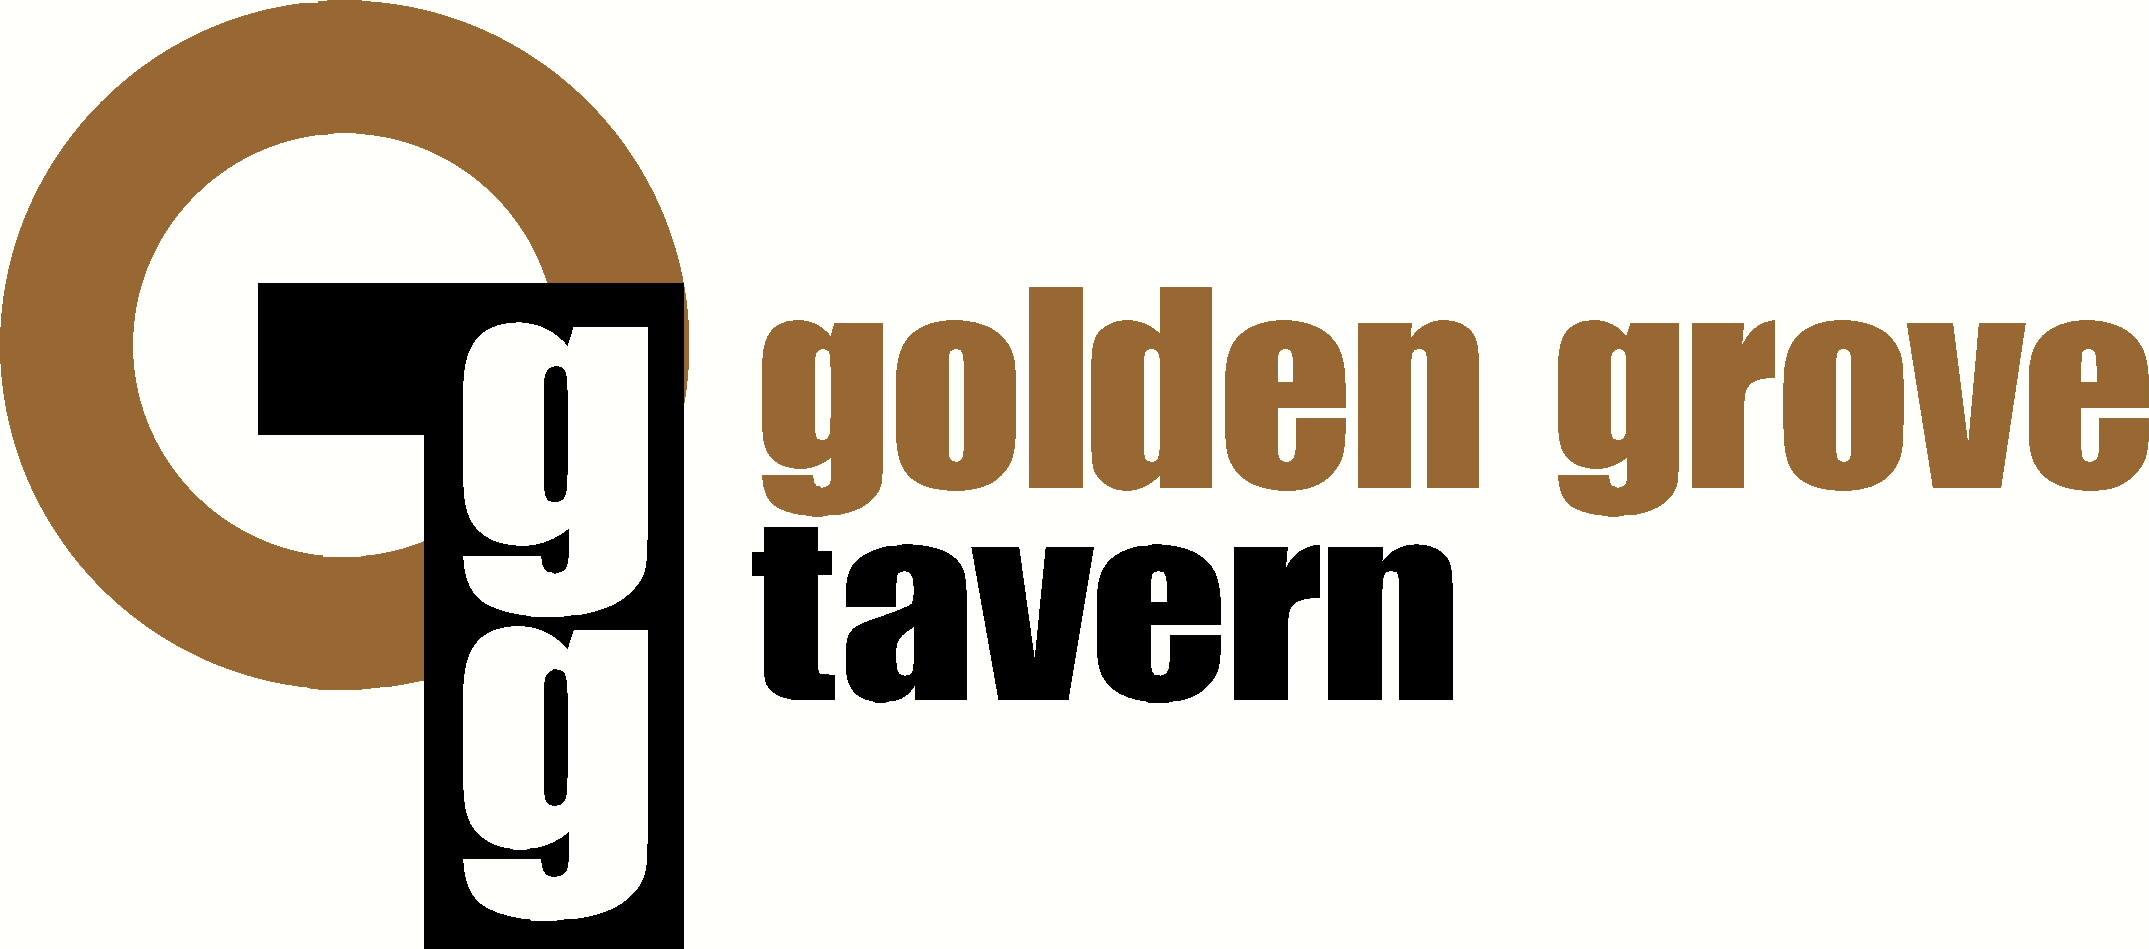 Golden Grove Tavern